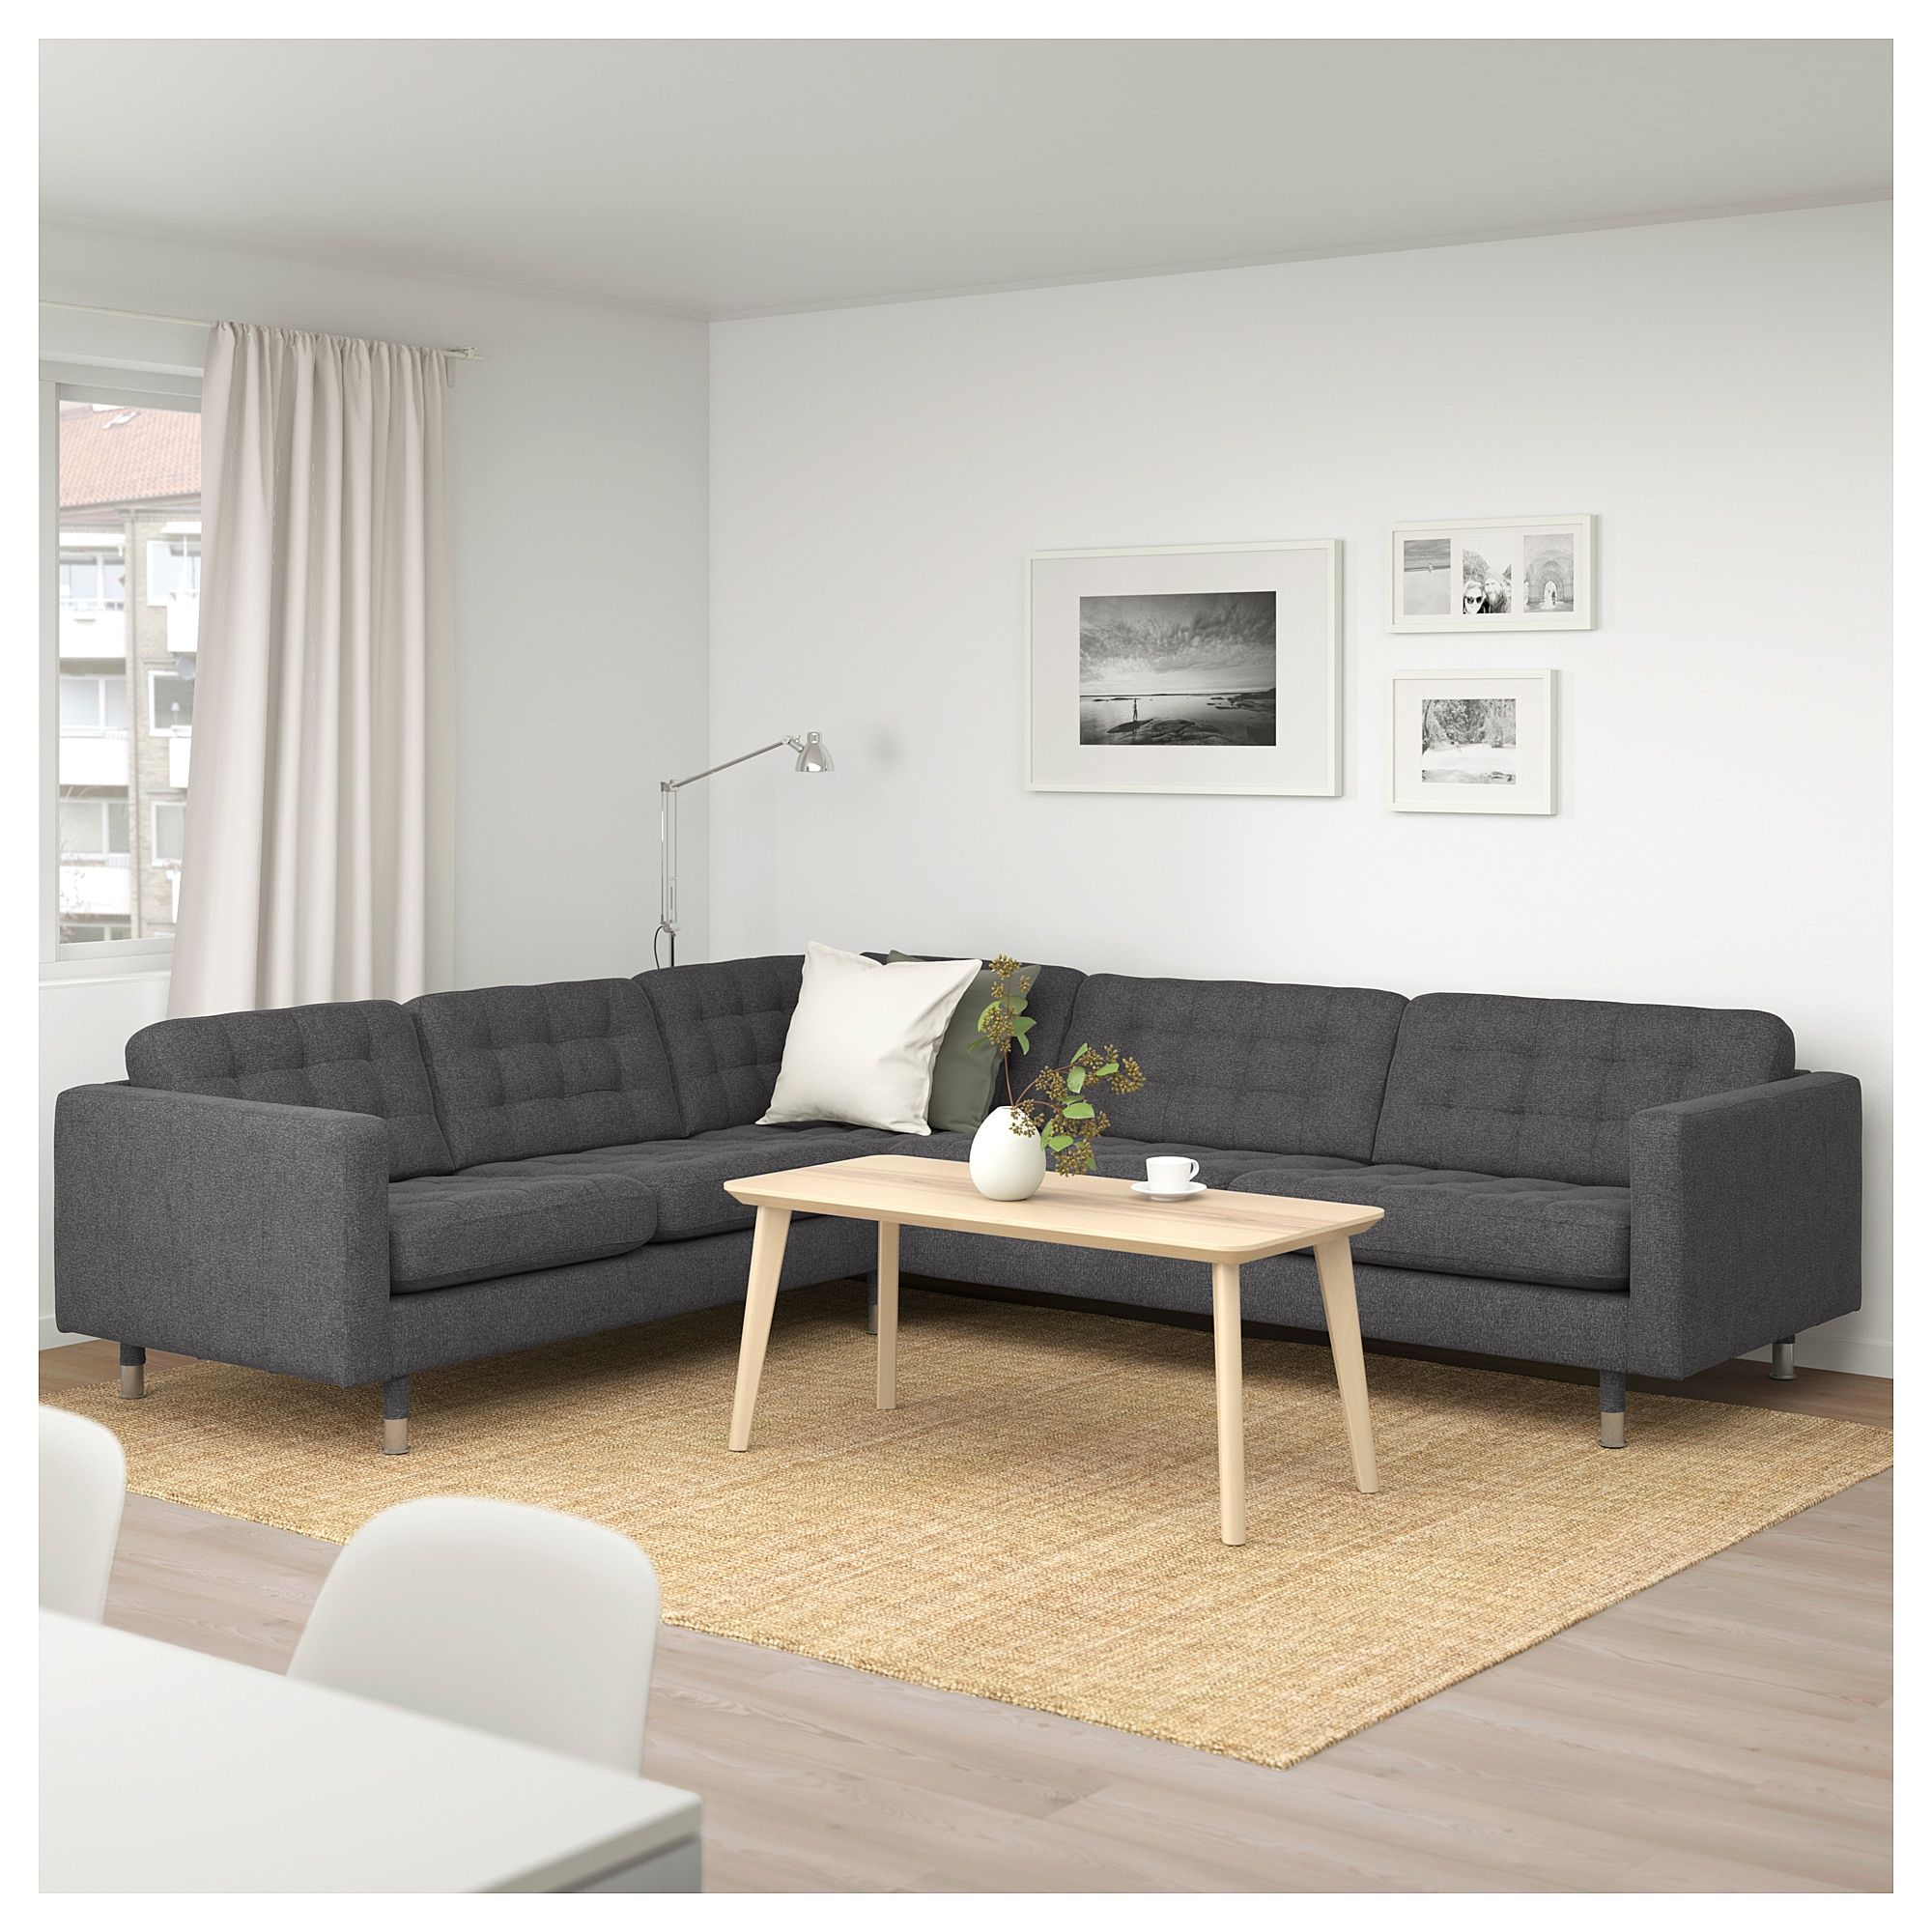 Strange Ikea Landskrona Sectional 5 Seat Corner Gunnared Dark Bralicious Painted Fabric Chair Ideas Braliciousco